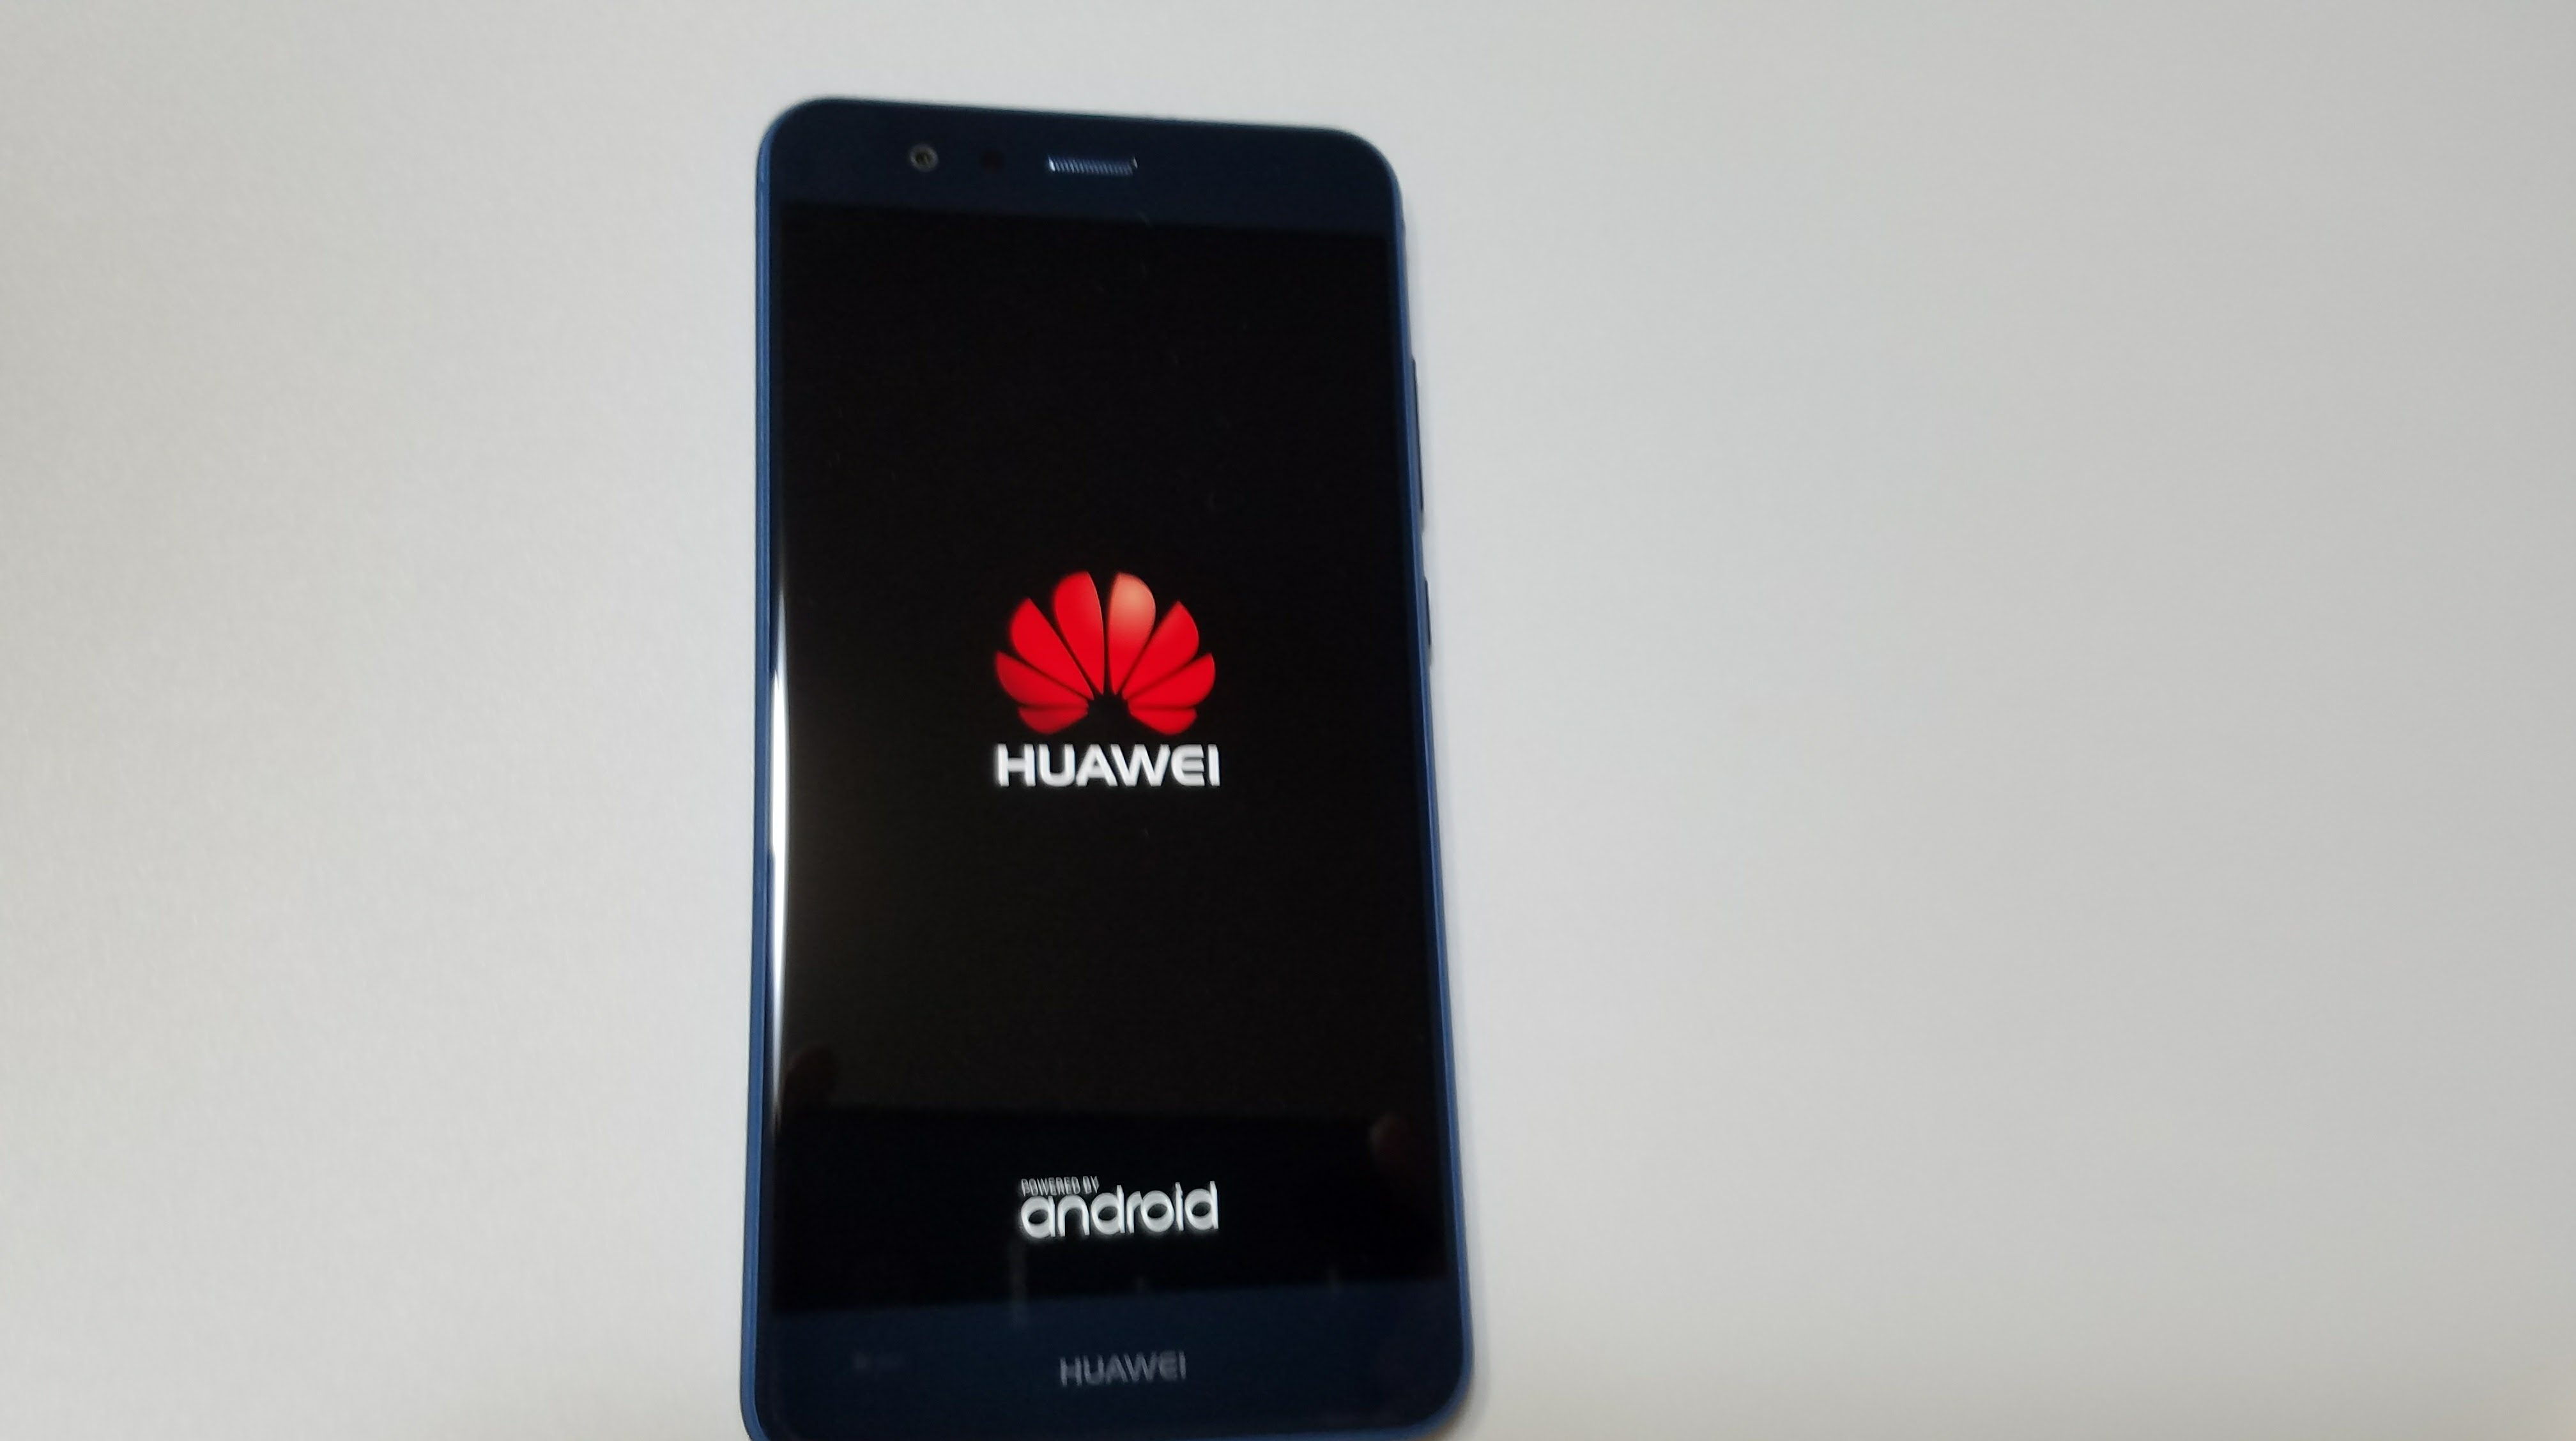 「HUAWEI P10 lite」がUQモバイル口座振替のSIMカードで起動